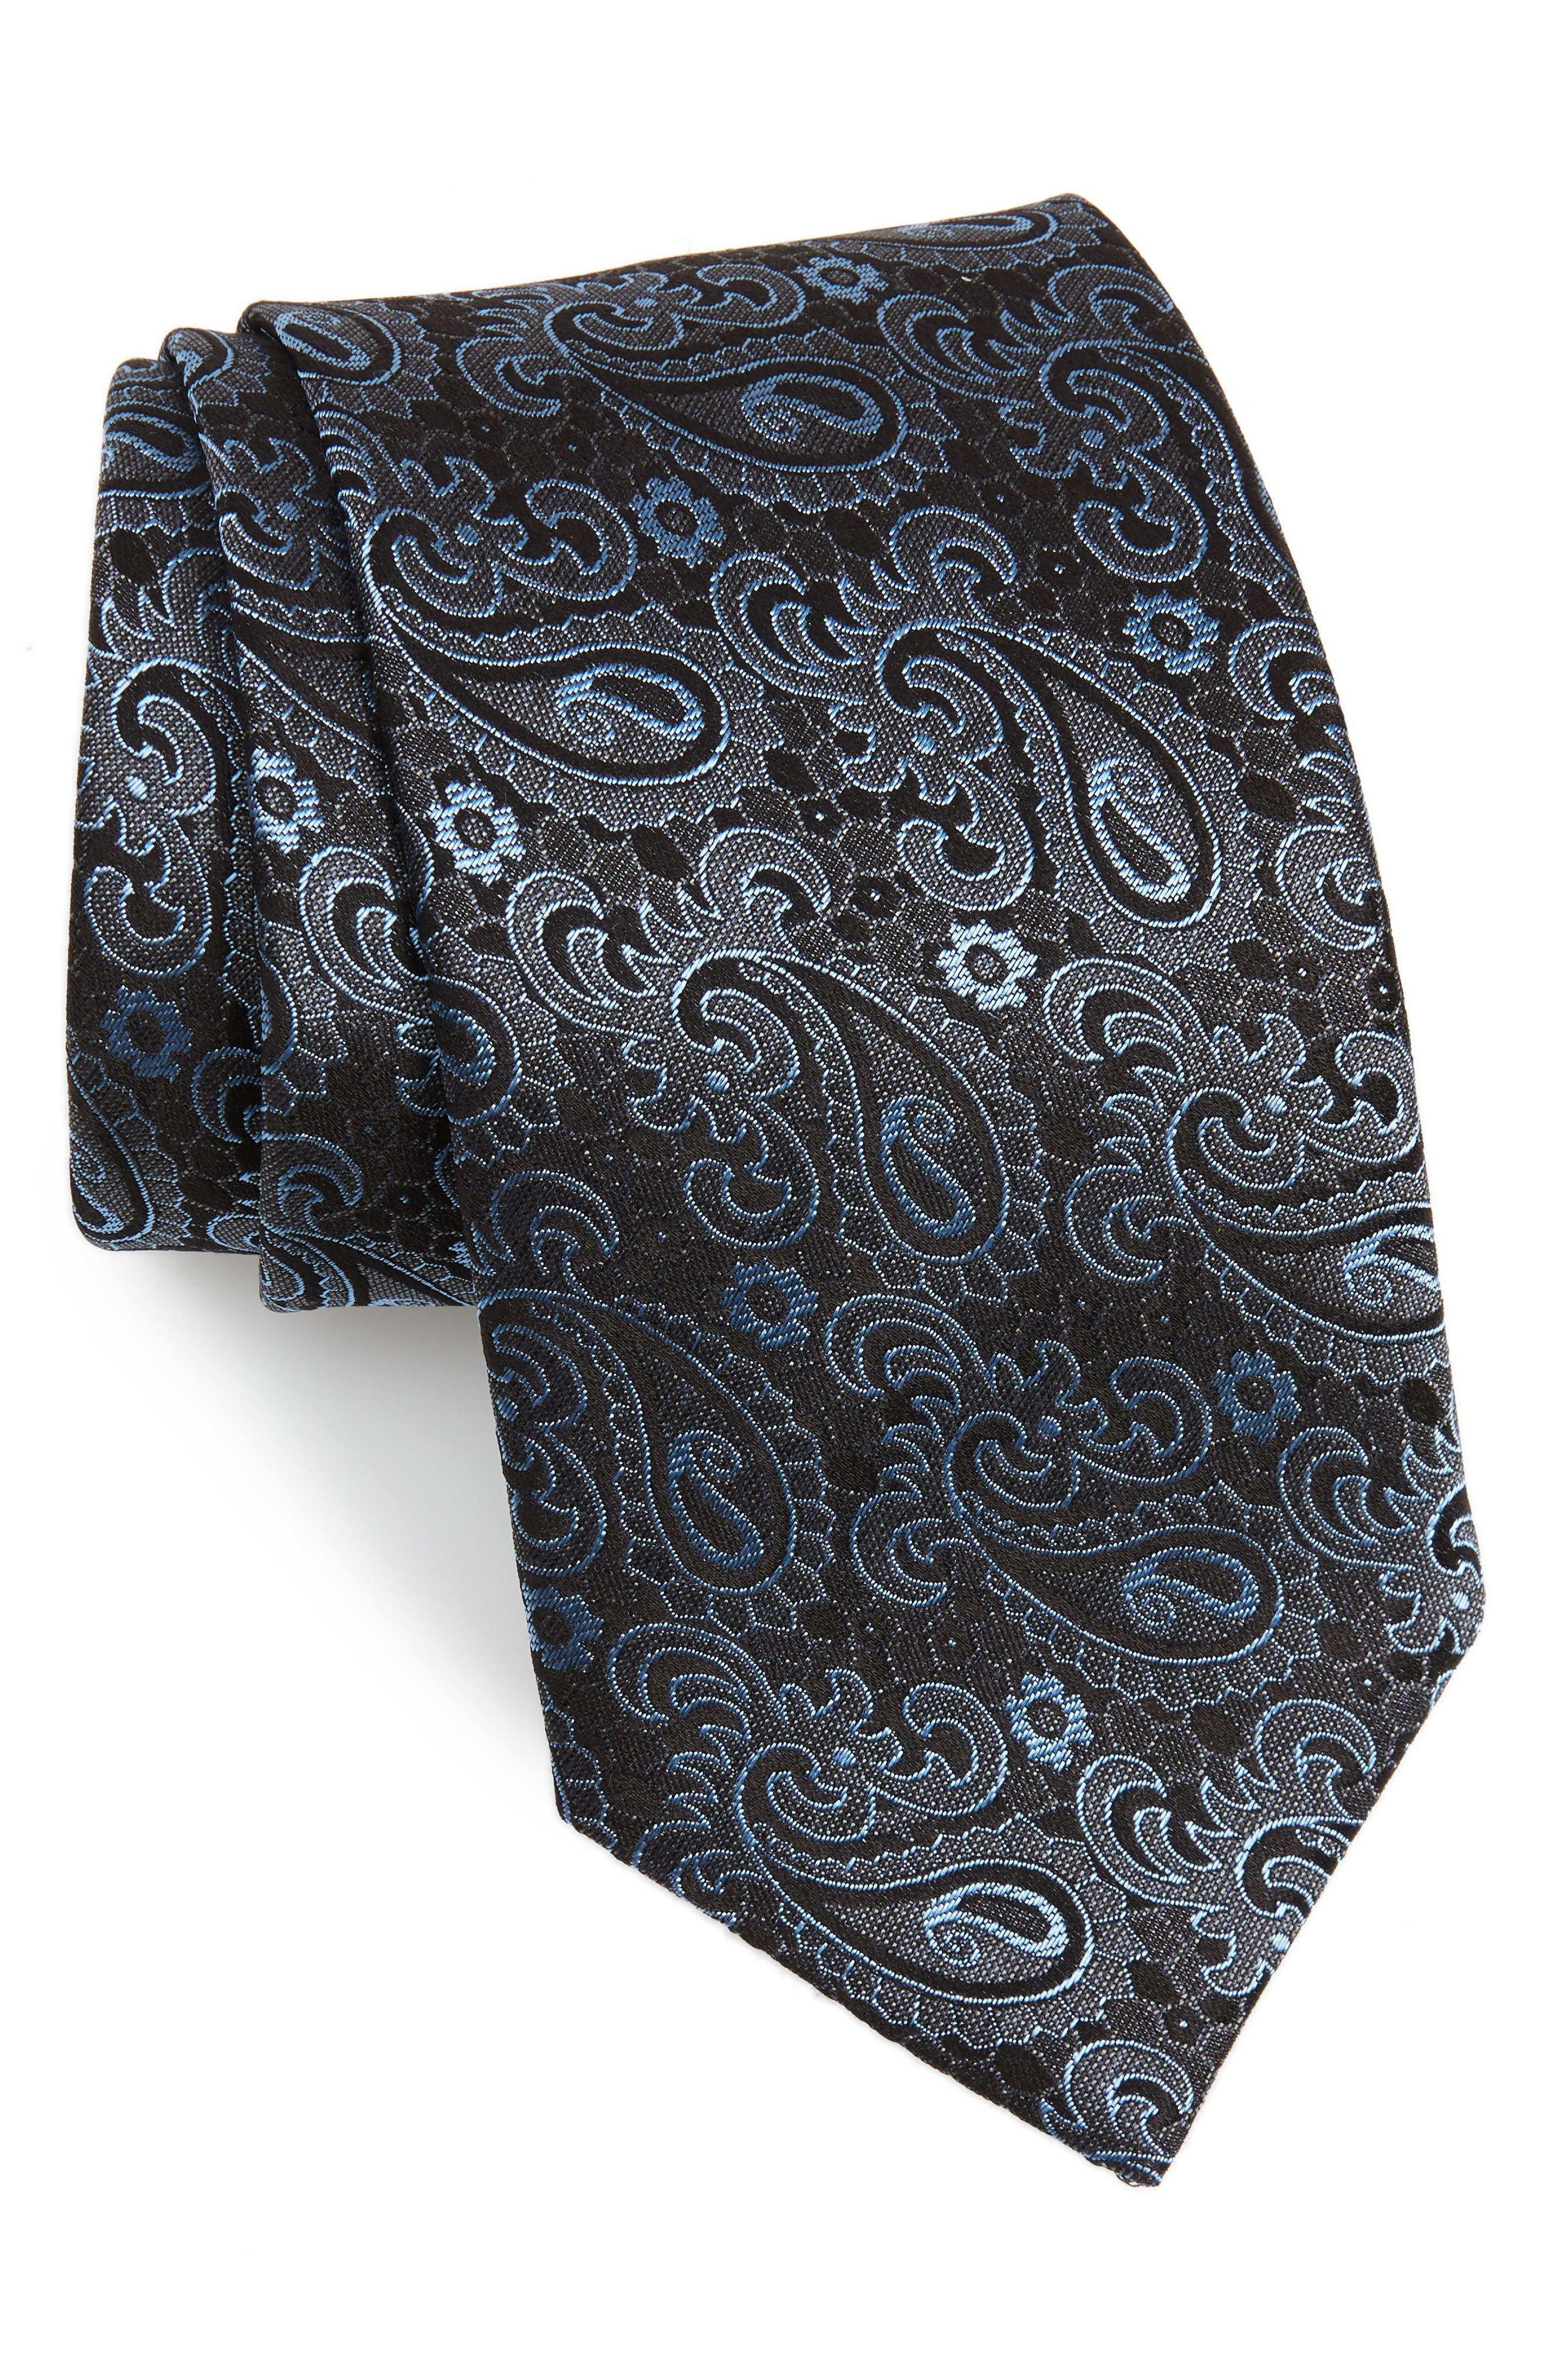 Paisley Silk Tie,                             Main thumbnail 1, color,                             CHARCOAL